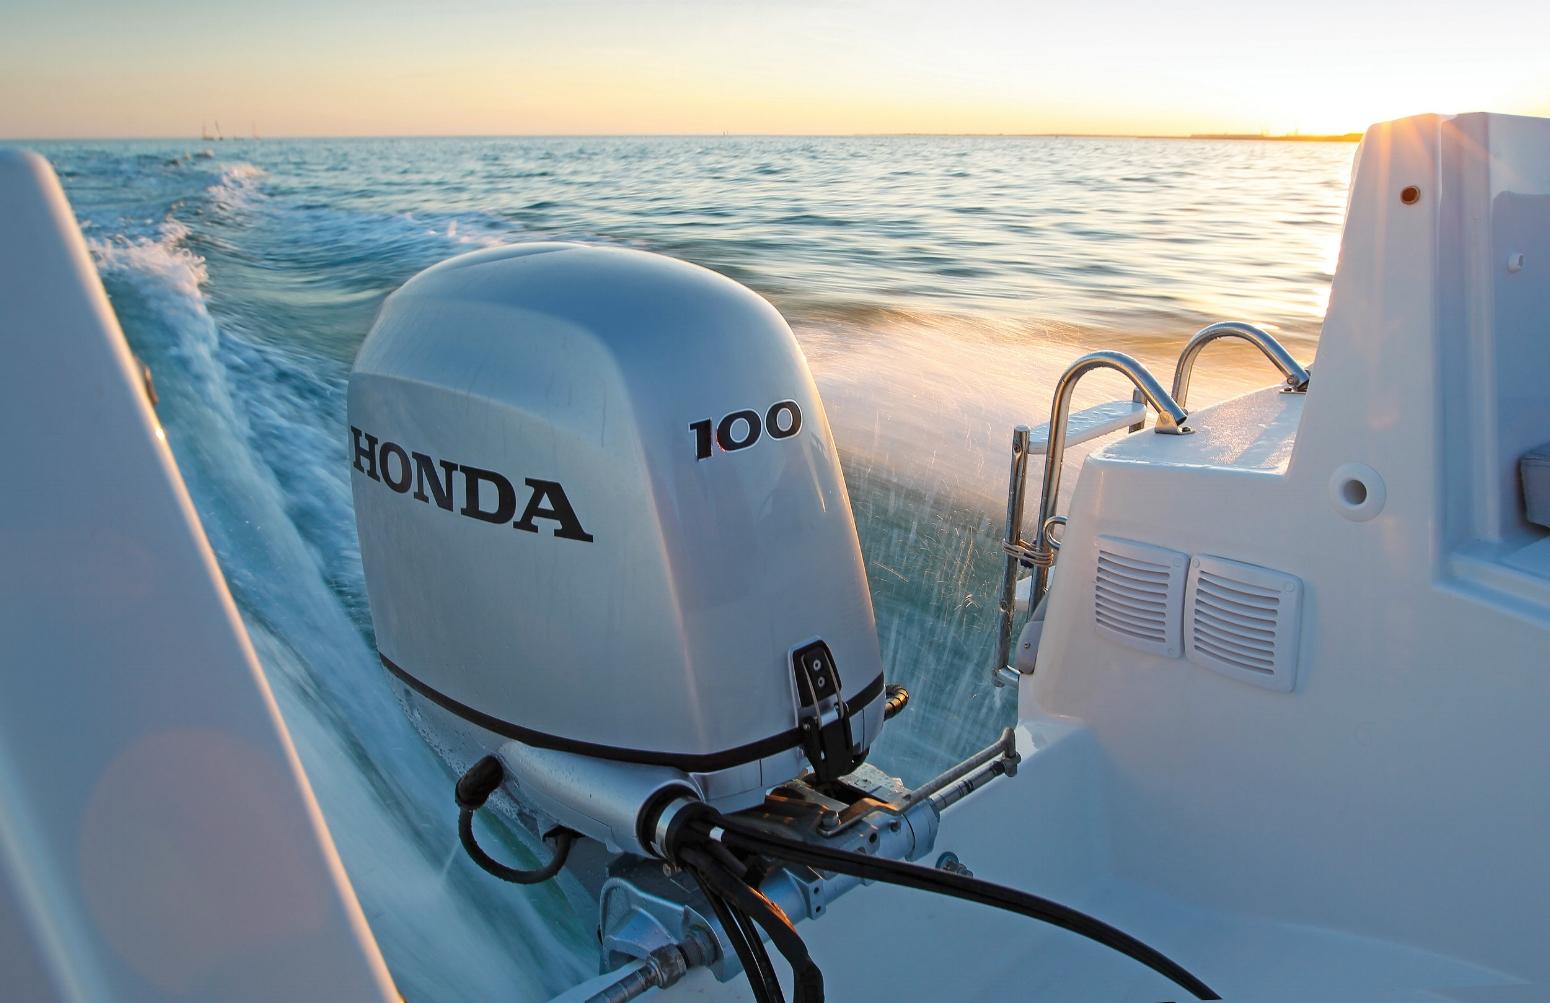 Honda Mid-Range Outboards - 25 - 100 hp